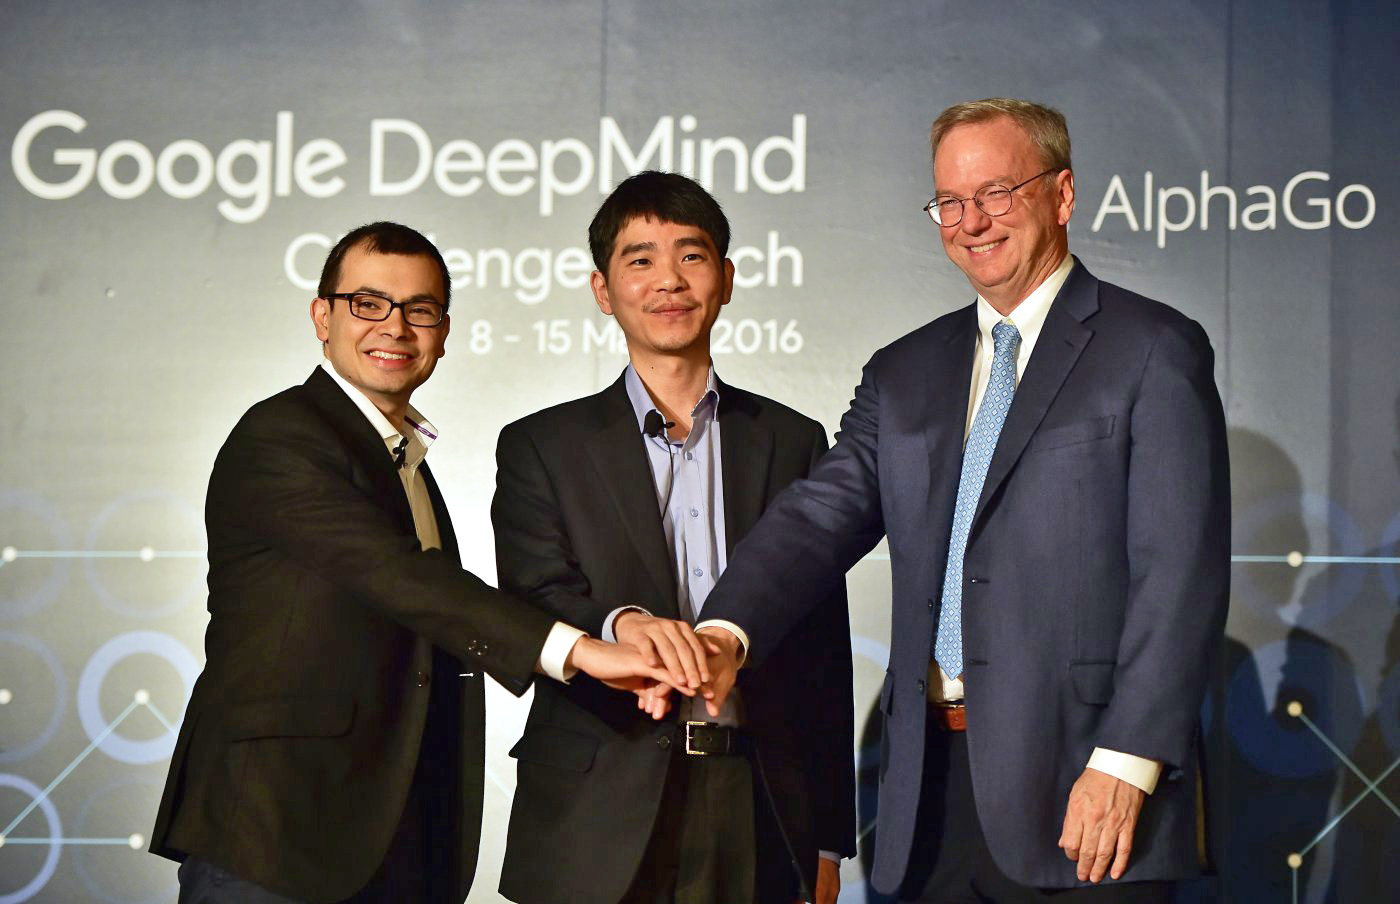 Google's Deepmind AI beats Go world champion in first match